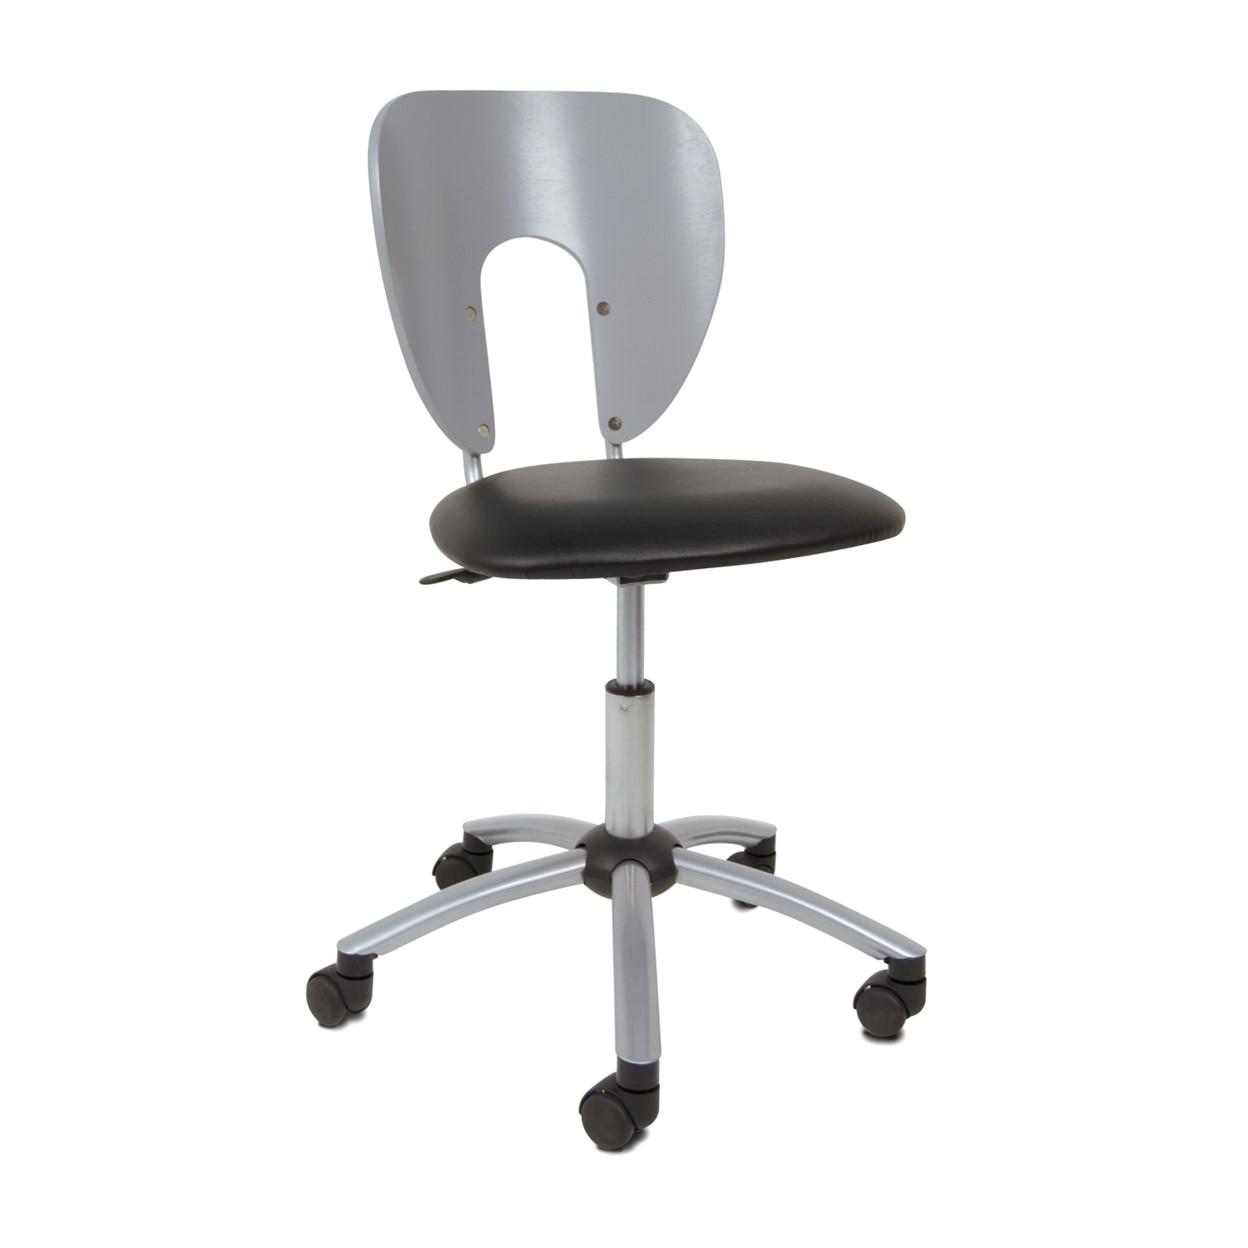 купить Studio Designs Home Office Futura Chair - Silver недорого